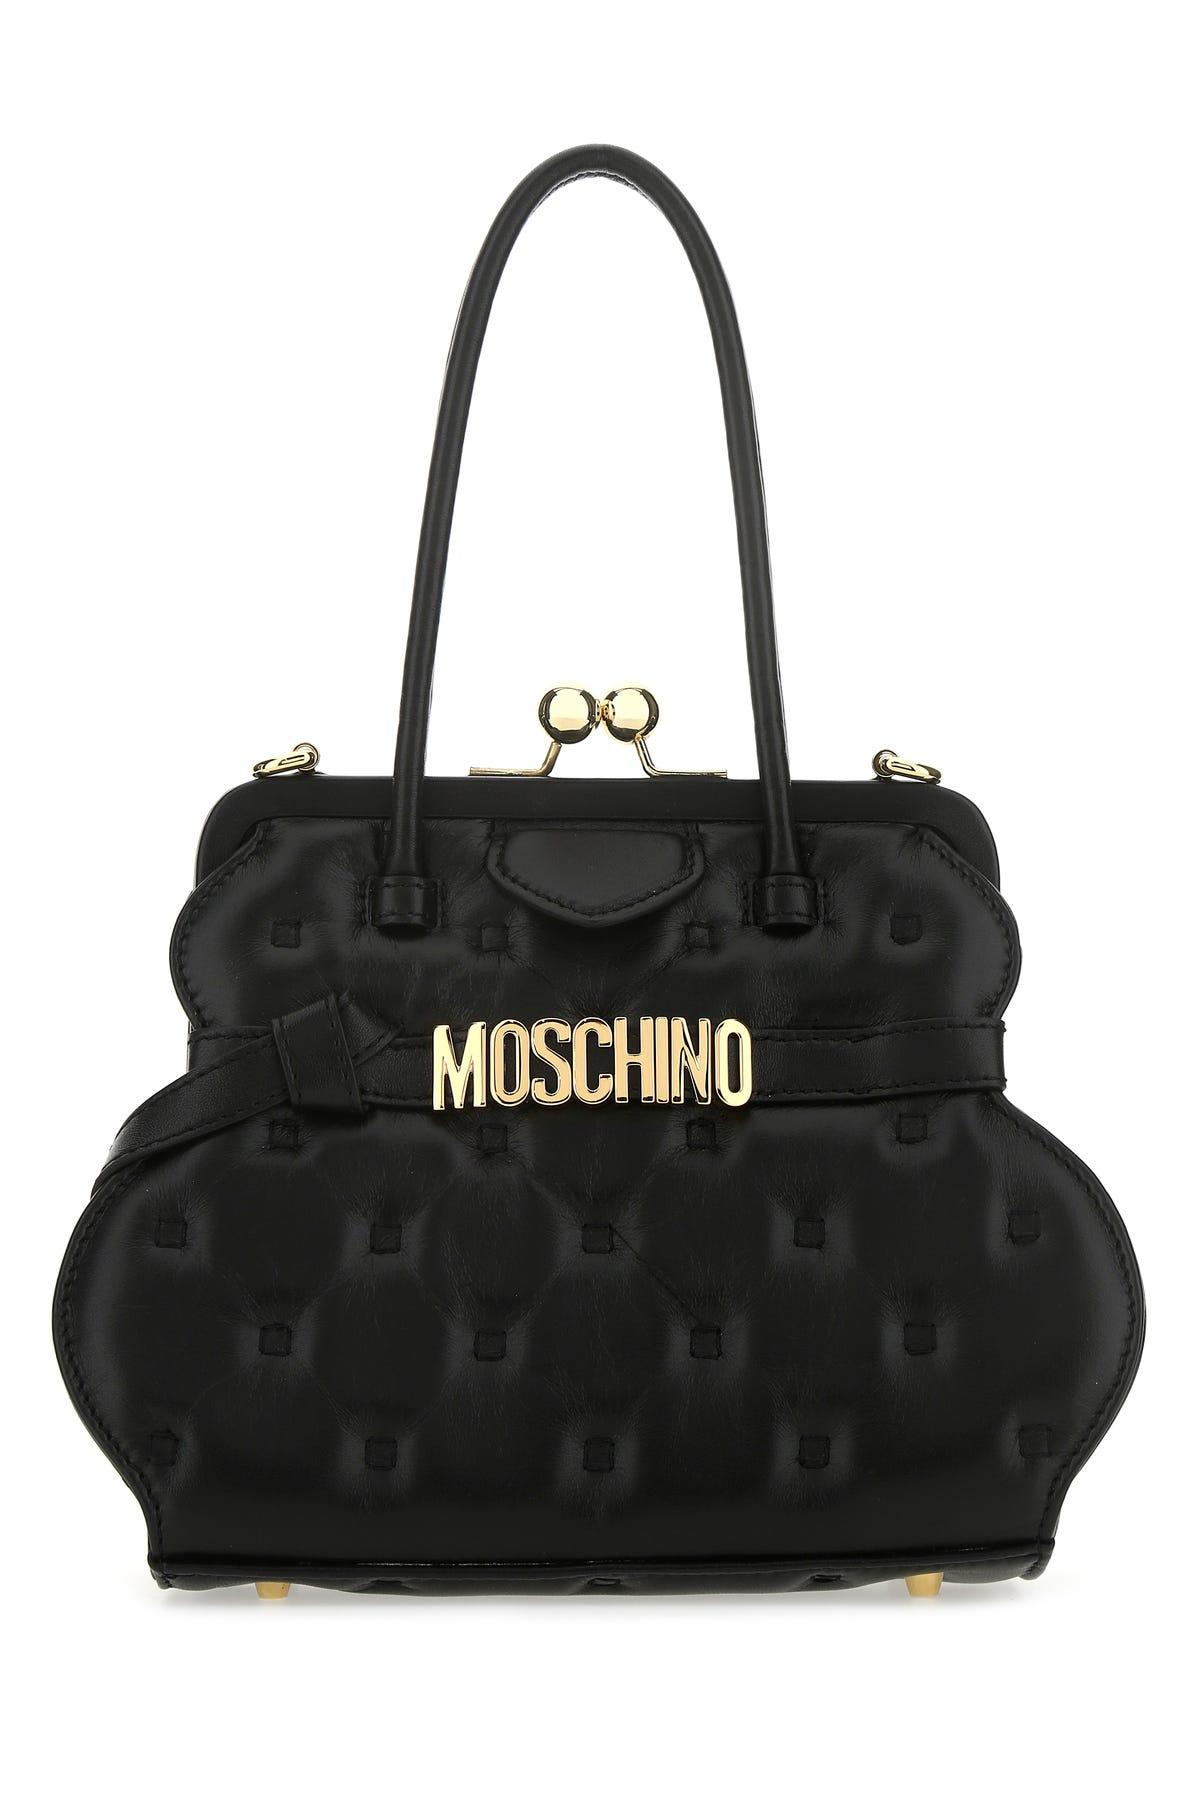 Moschino Leathers BORSA-TU